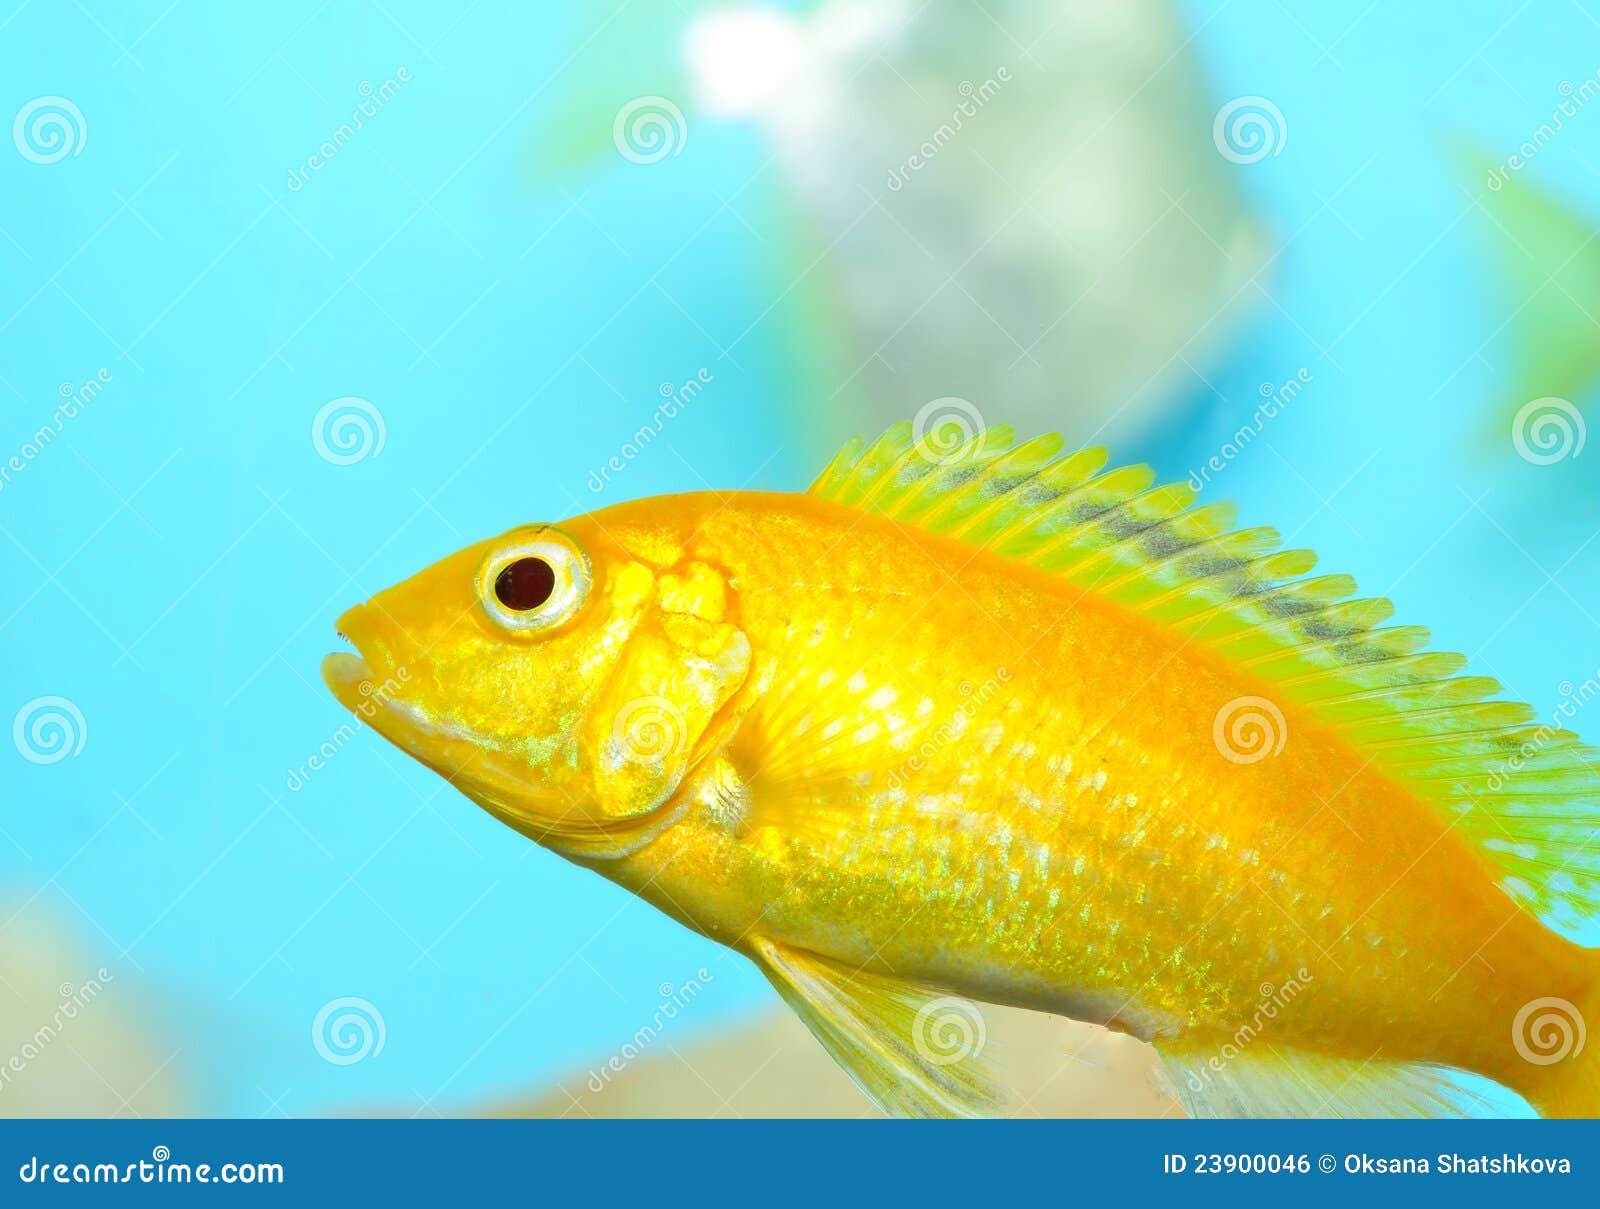 Aquarium fish royalty free stock image image 23900046 for Yellow fish tank water